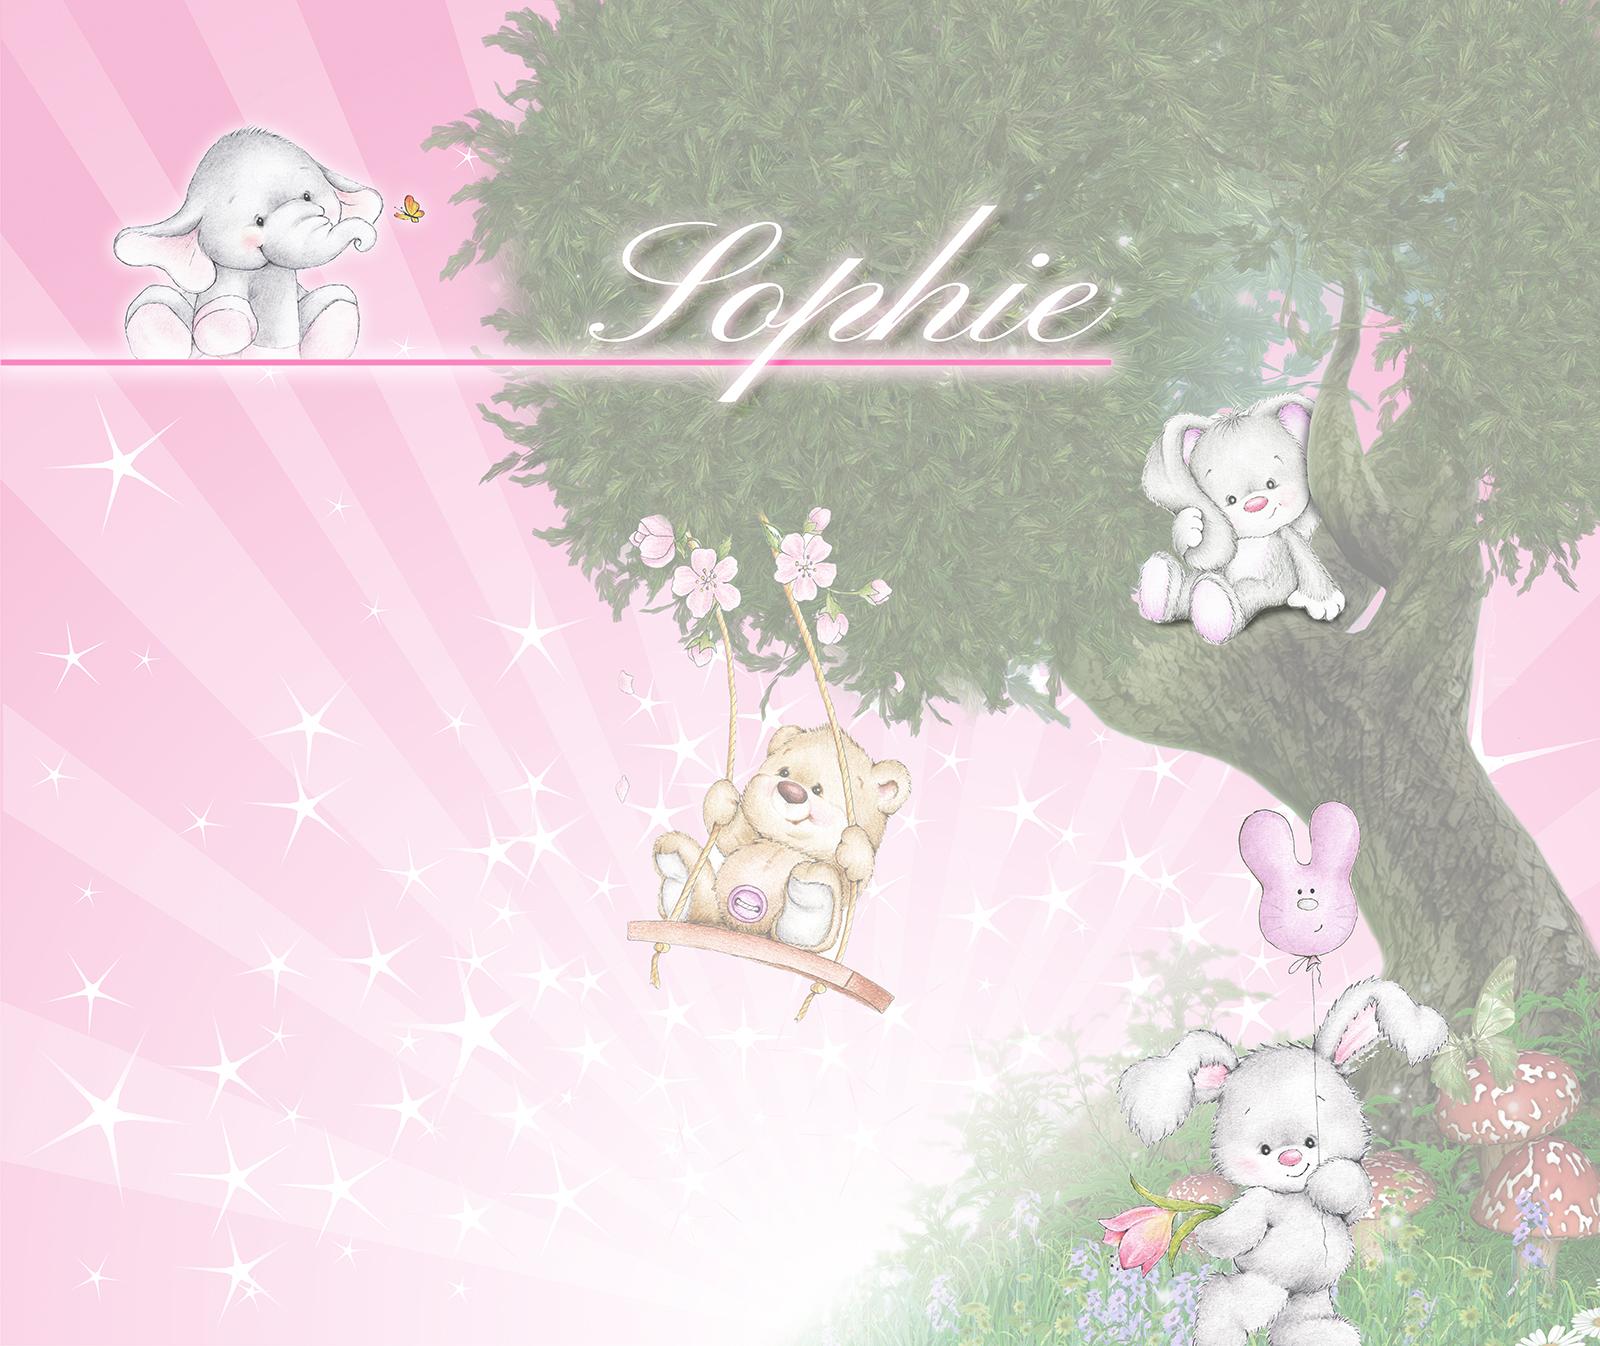 Fotobehang roze babykamer